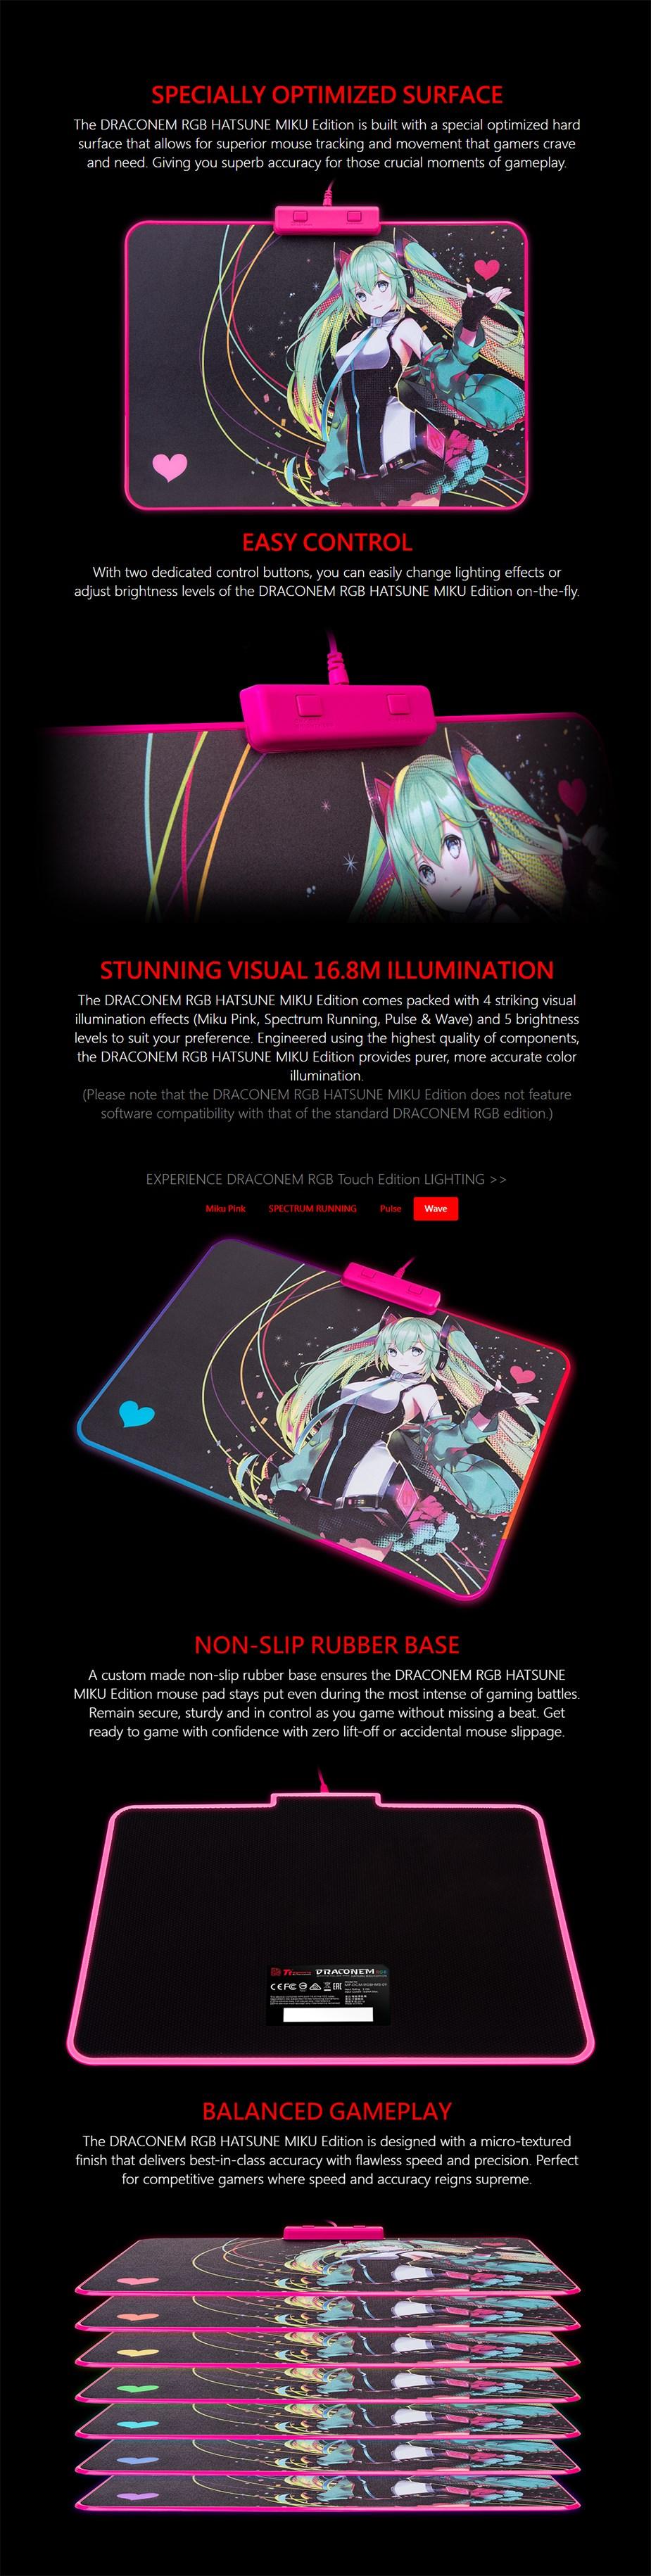 Tt eSPORTS Draconem RGB Hard Mouse Pad - Hatsune Miku Edition - Desktop Overview 1